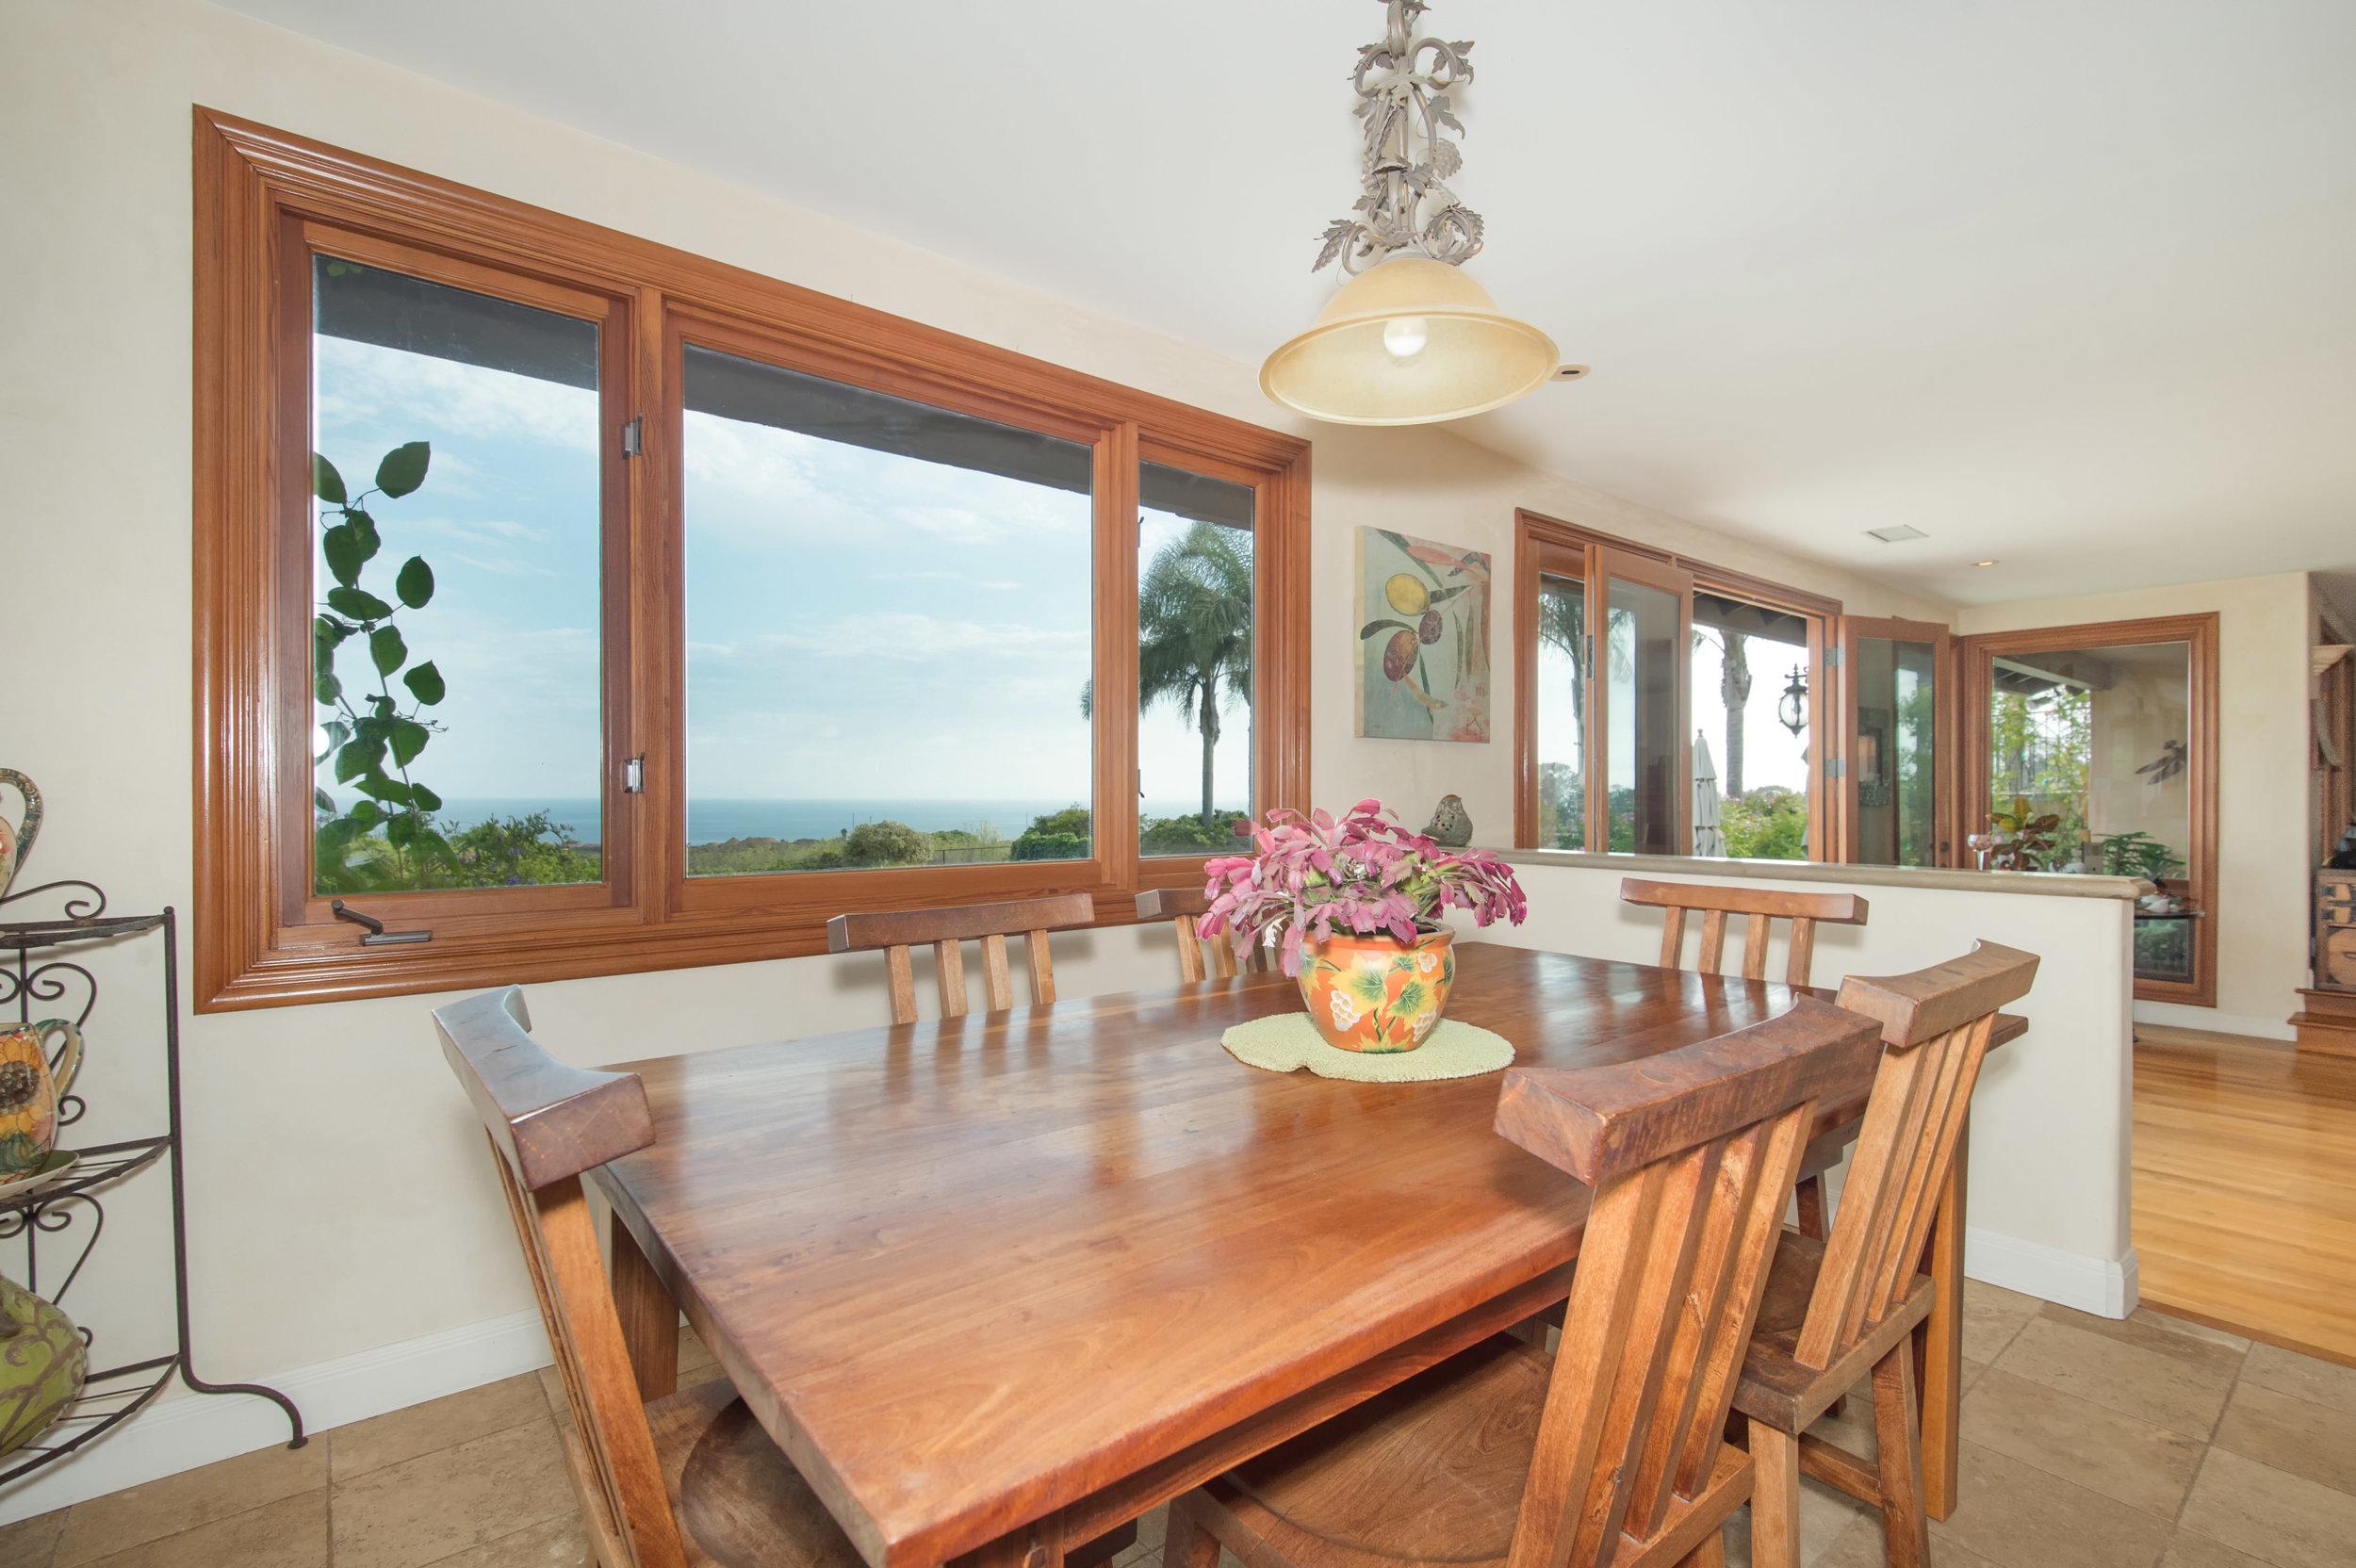 013 dining kitchen 29660 Harvester Road Malibu For Sale The Malibu Life Team Luxury Real Estate.jpg